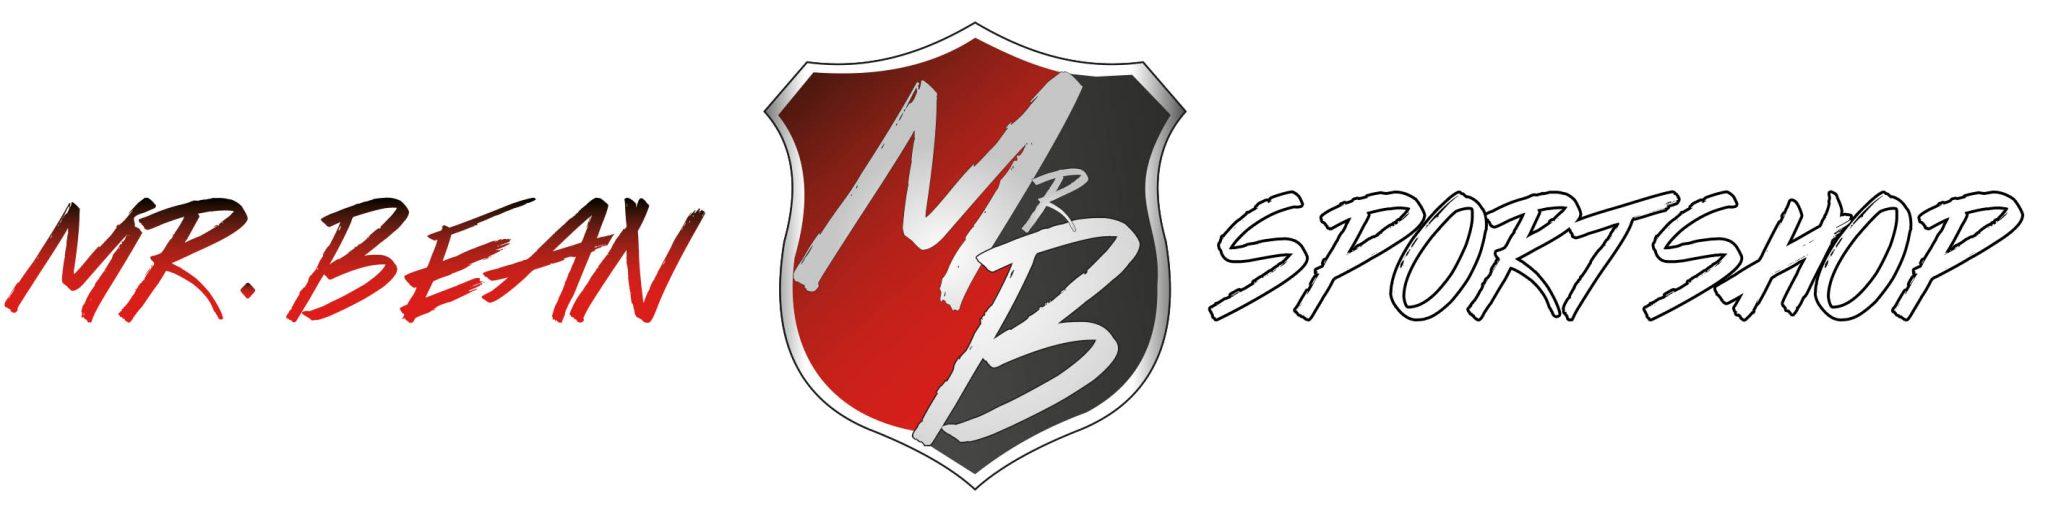 Mr Bean Sport Shop Zrenjanin - Patike i sportska odeća i prateća oprema